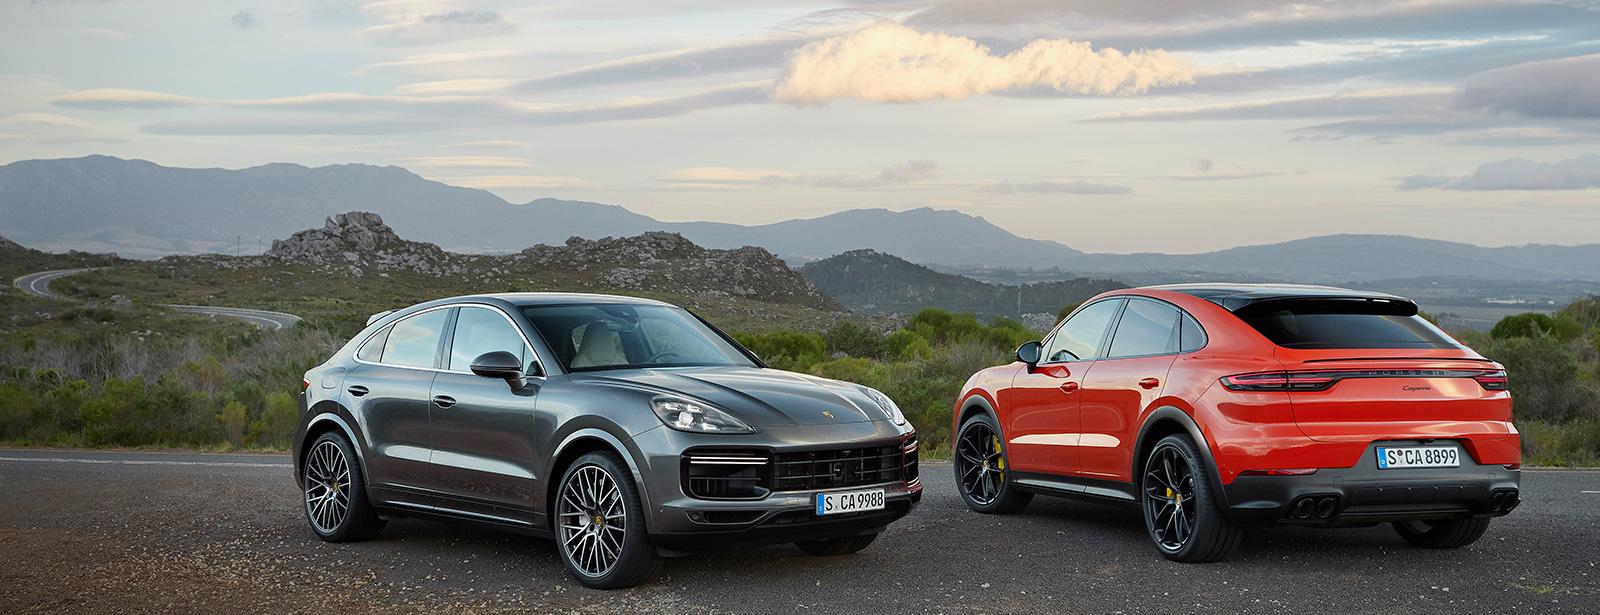 Porsche Cayenne Model Style